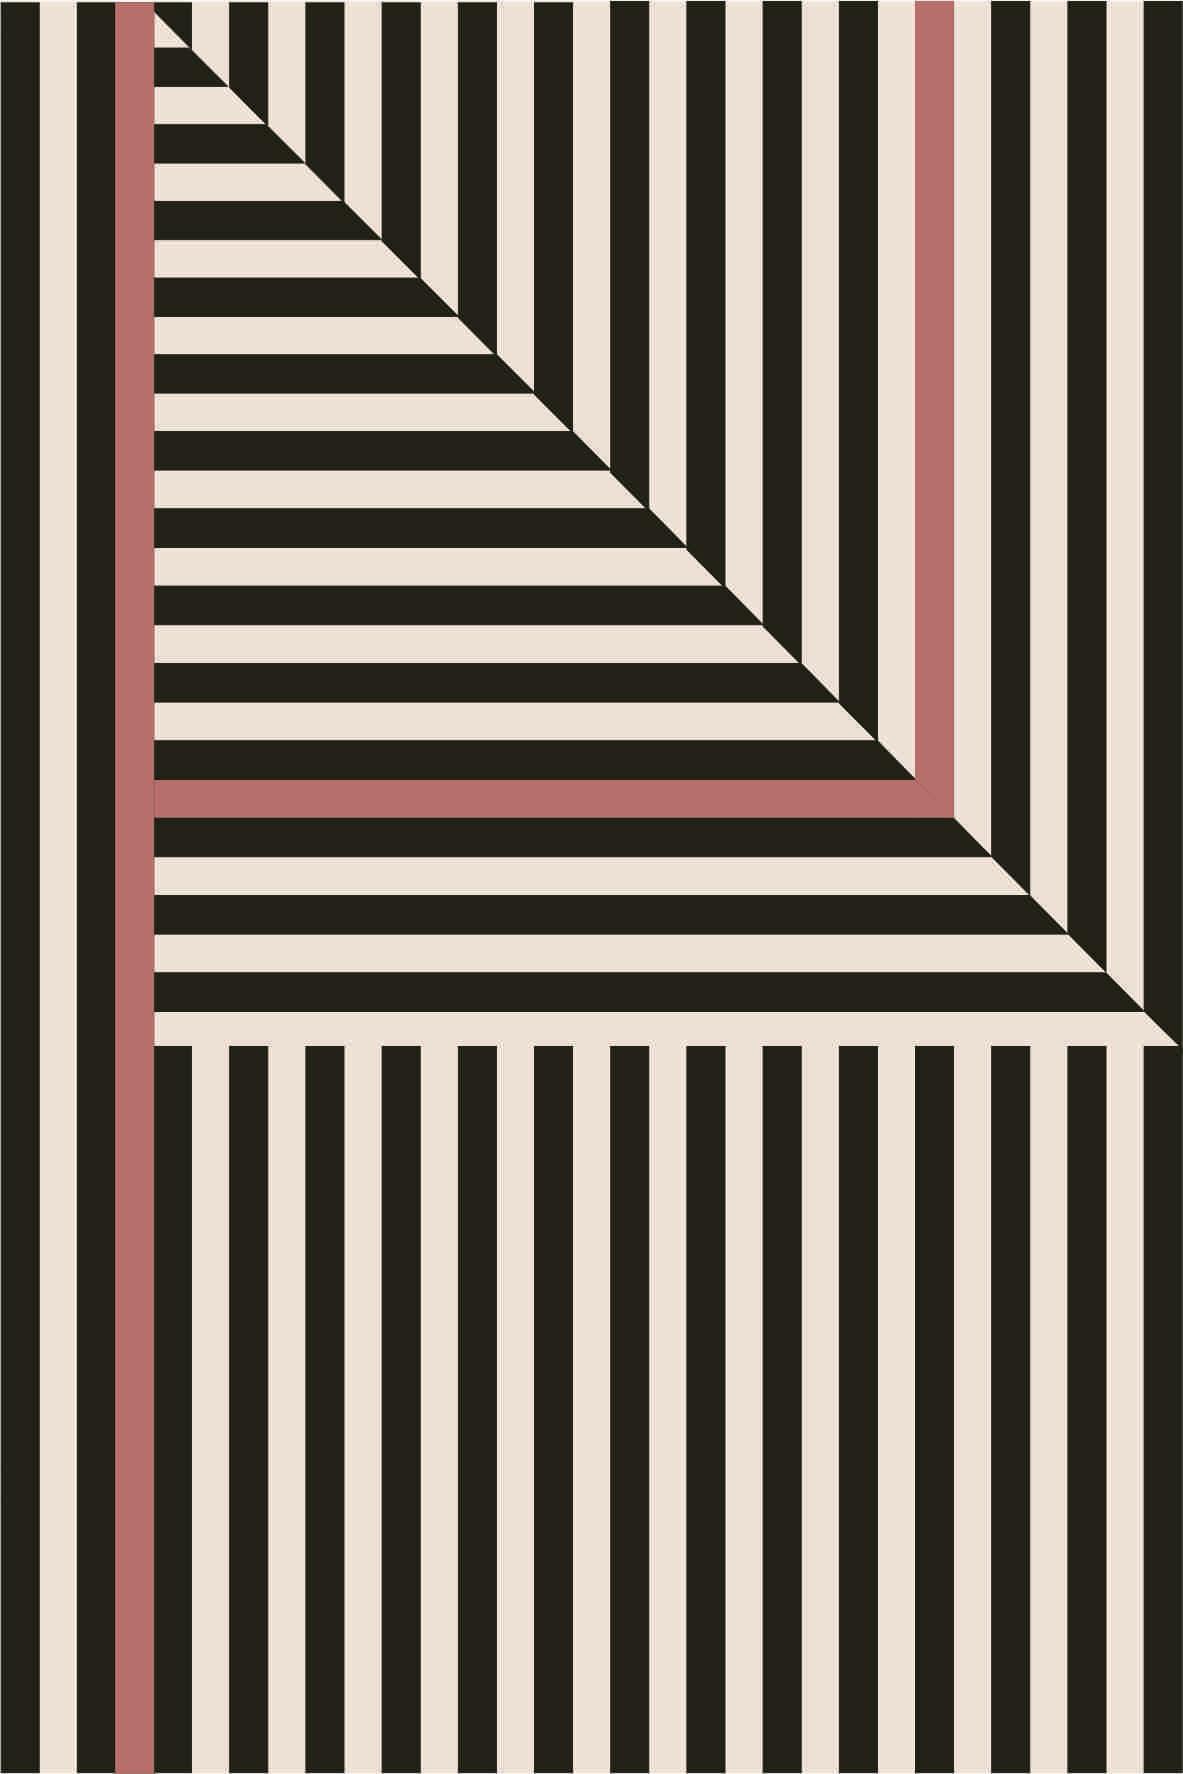 25 | Turn The Page - Lynne Bradley